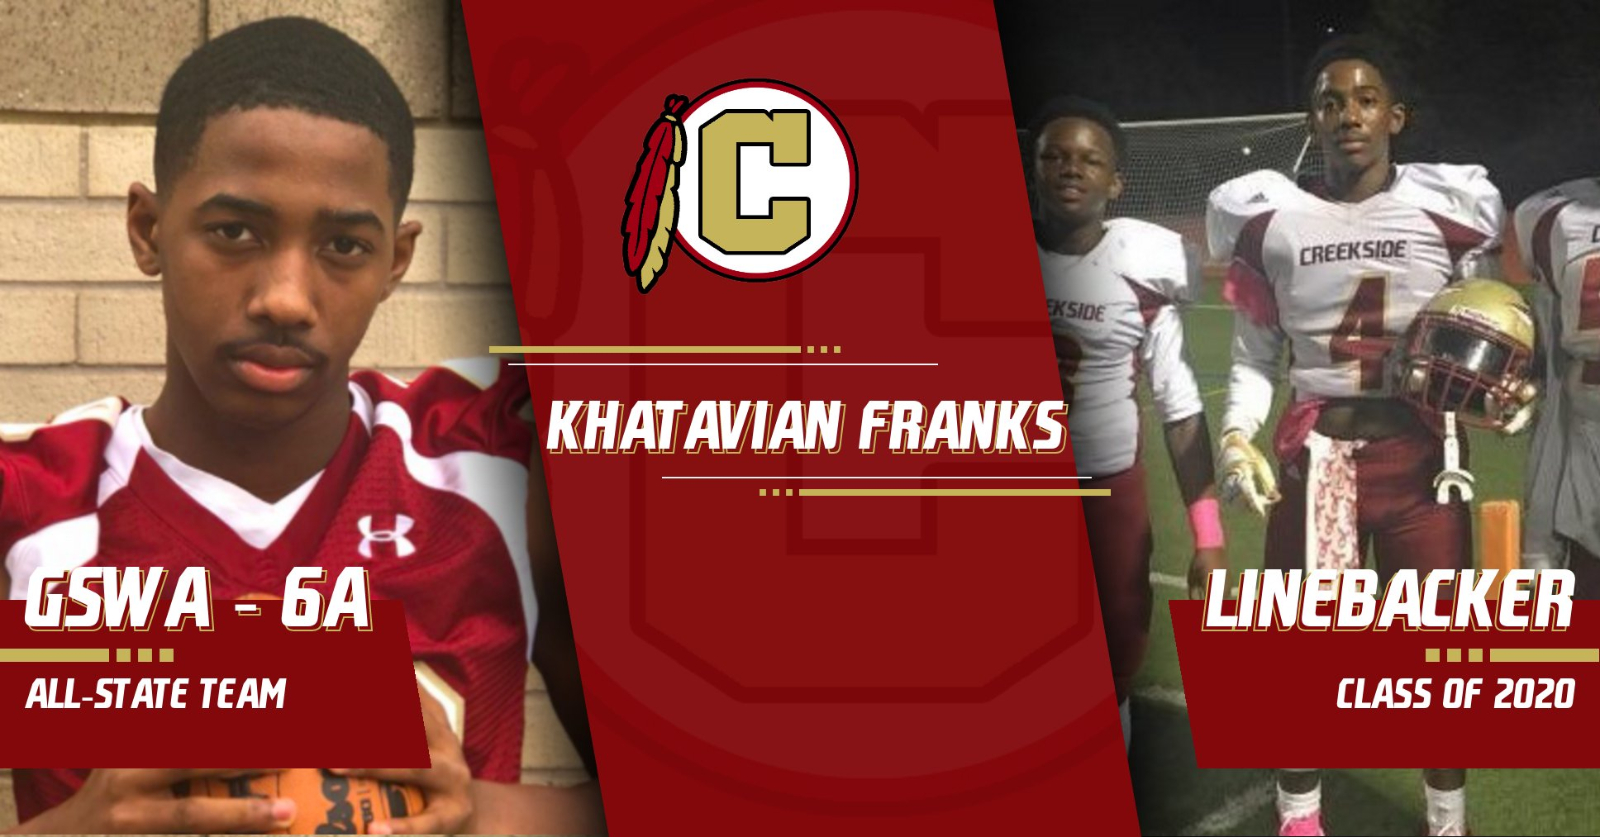 Khatavian Franks Honored by GSWA